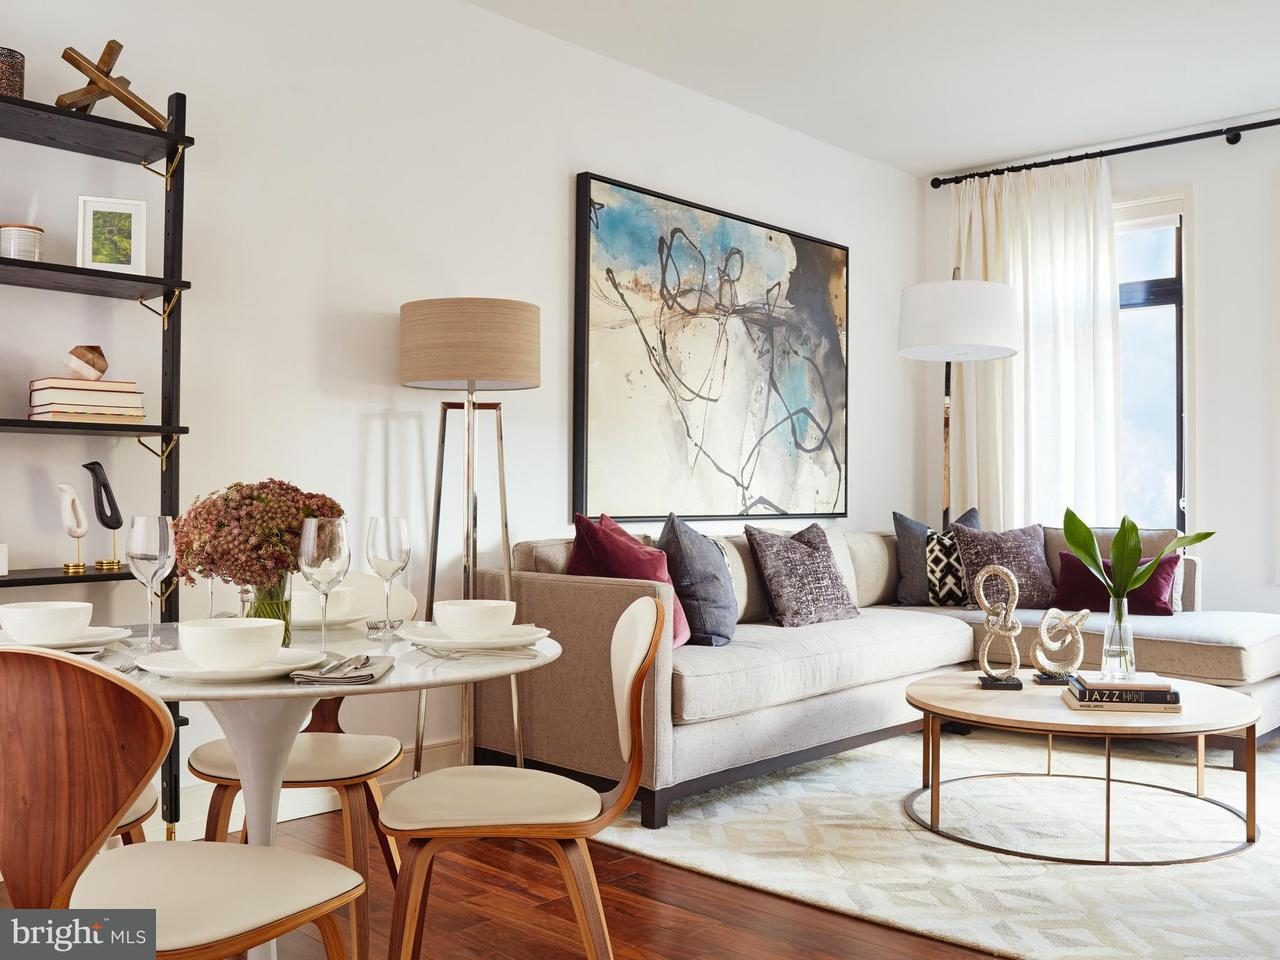 Condominium for Rent at 1310 U St NW #405 Washington, District Of Columbia 20009 United States